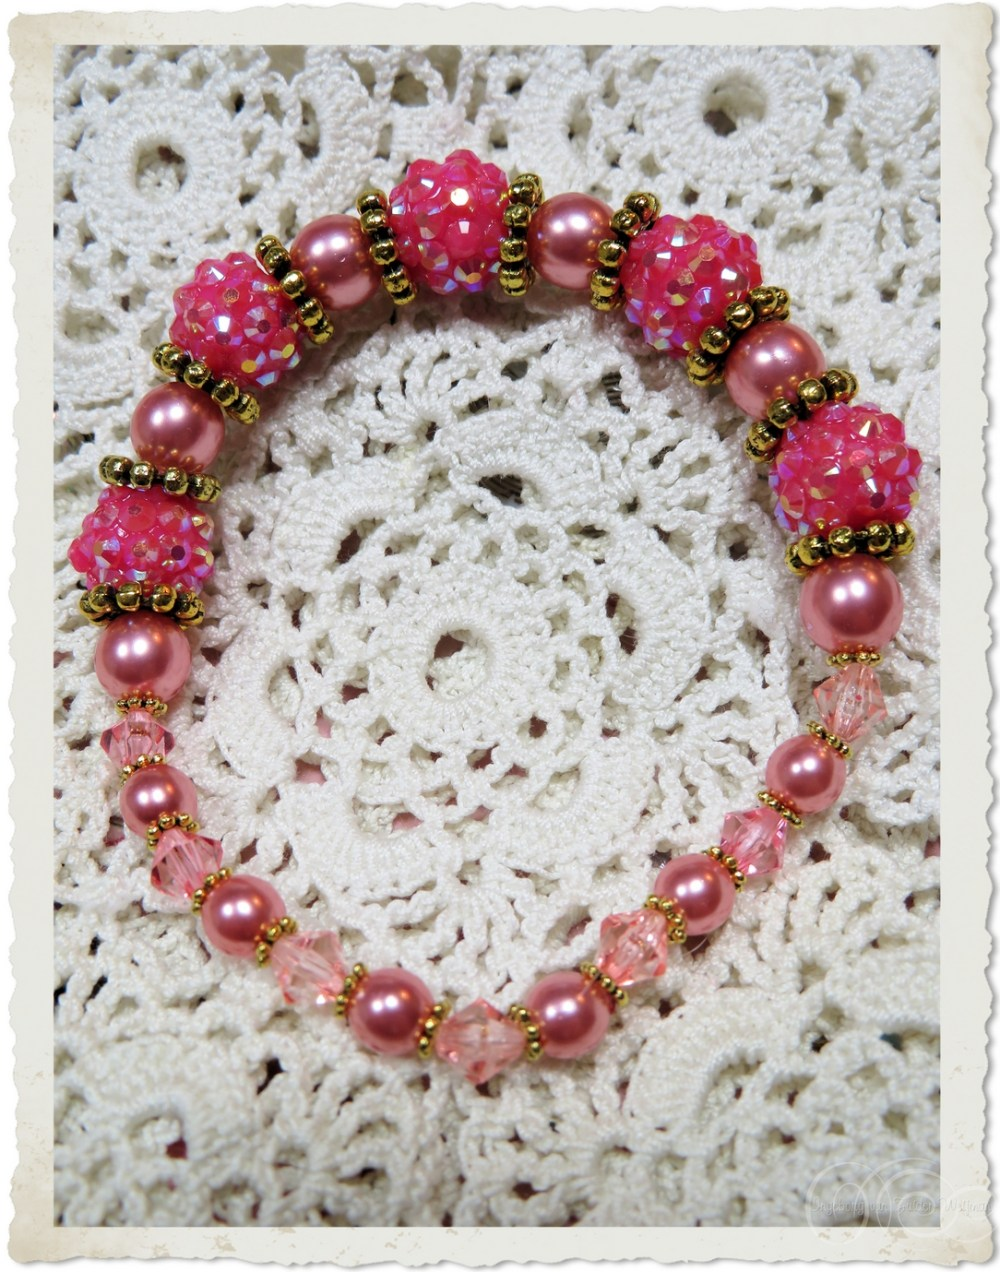 Handmade pink pearl shamballa bracelet by Ingeborg van Zuiden